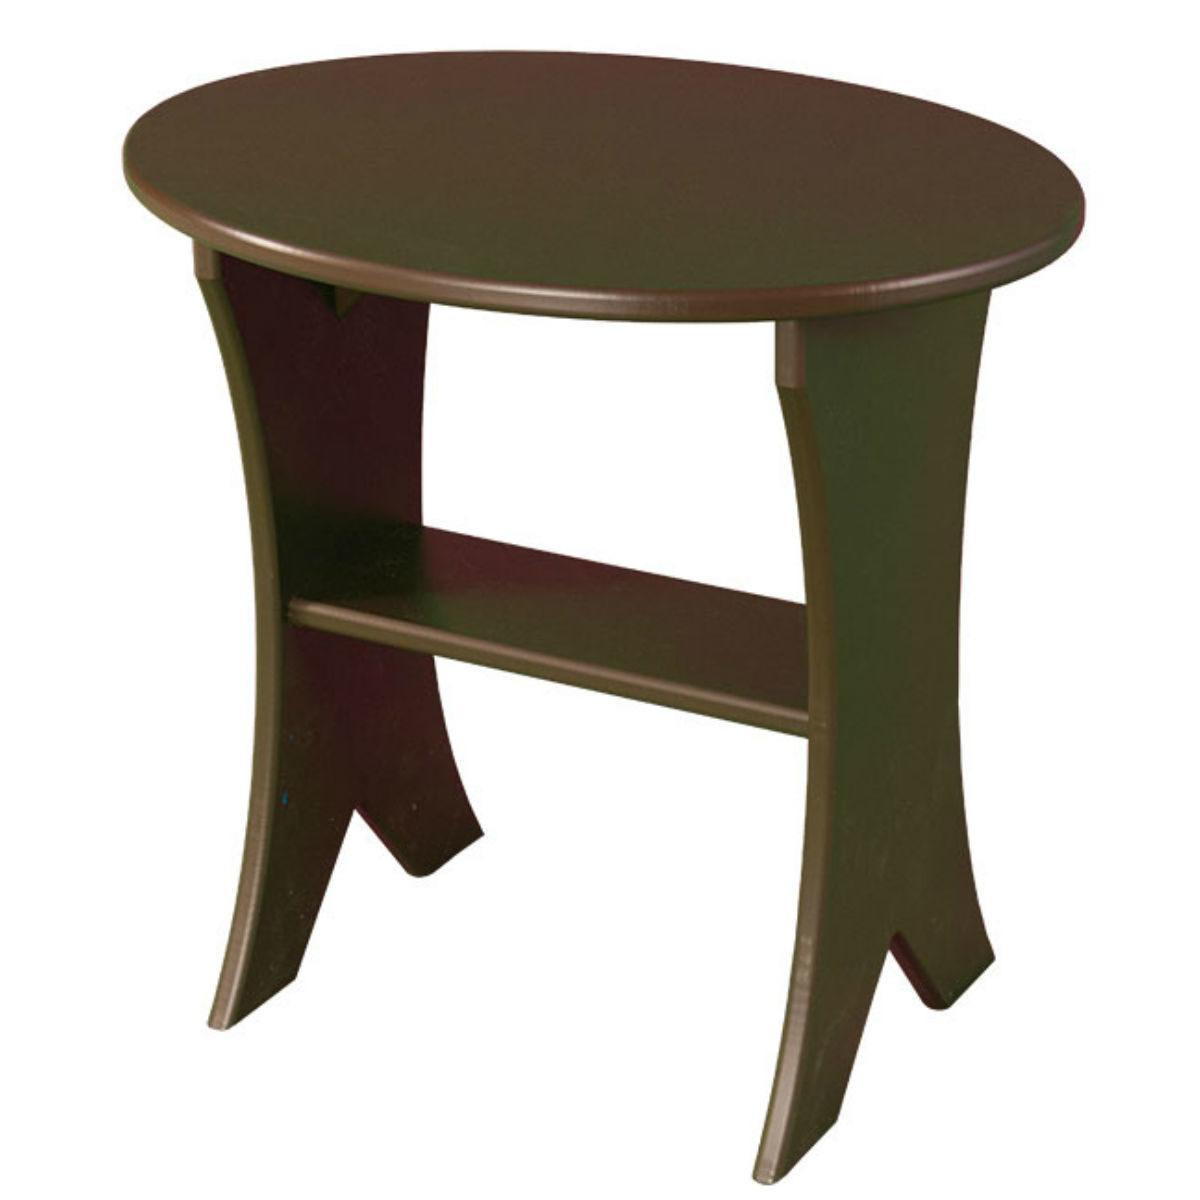 Muskoka Springs Oval End Table